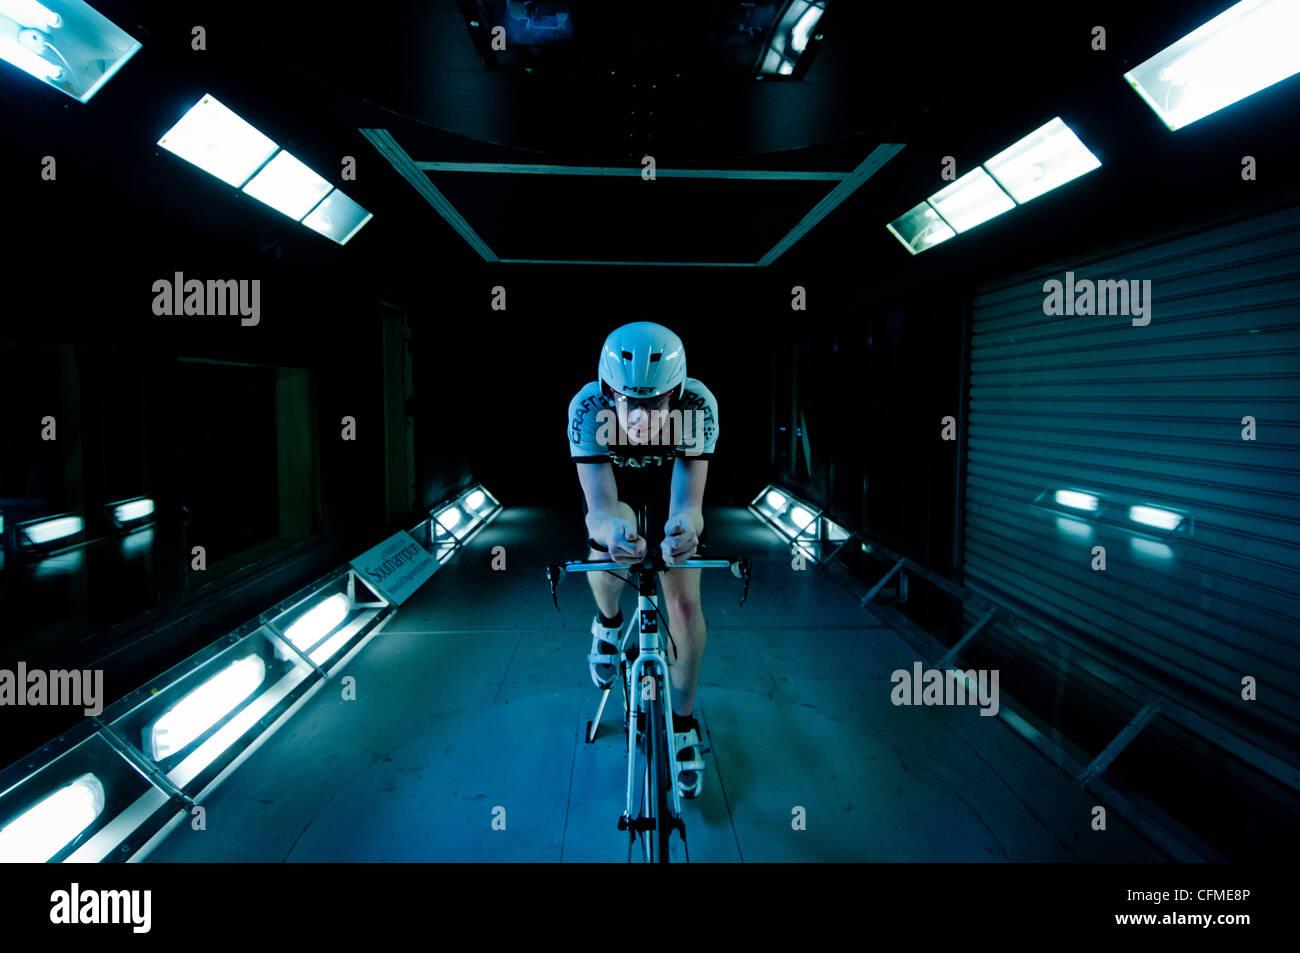 Wind tunnel training - Stock Image